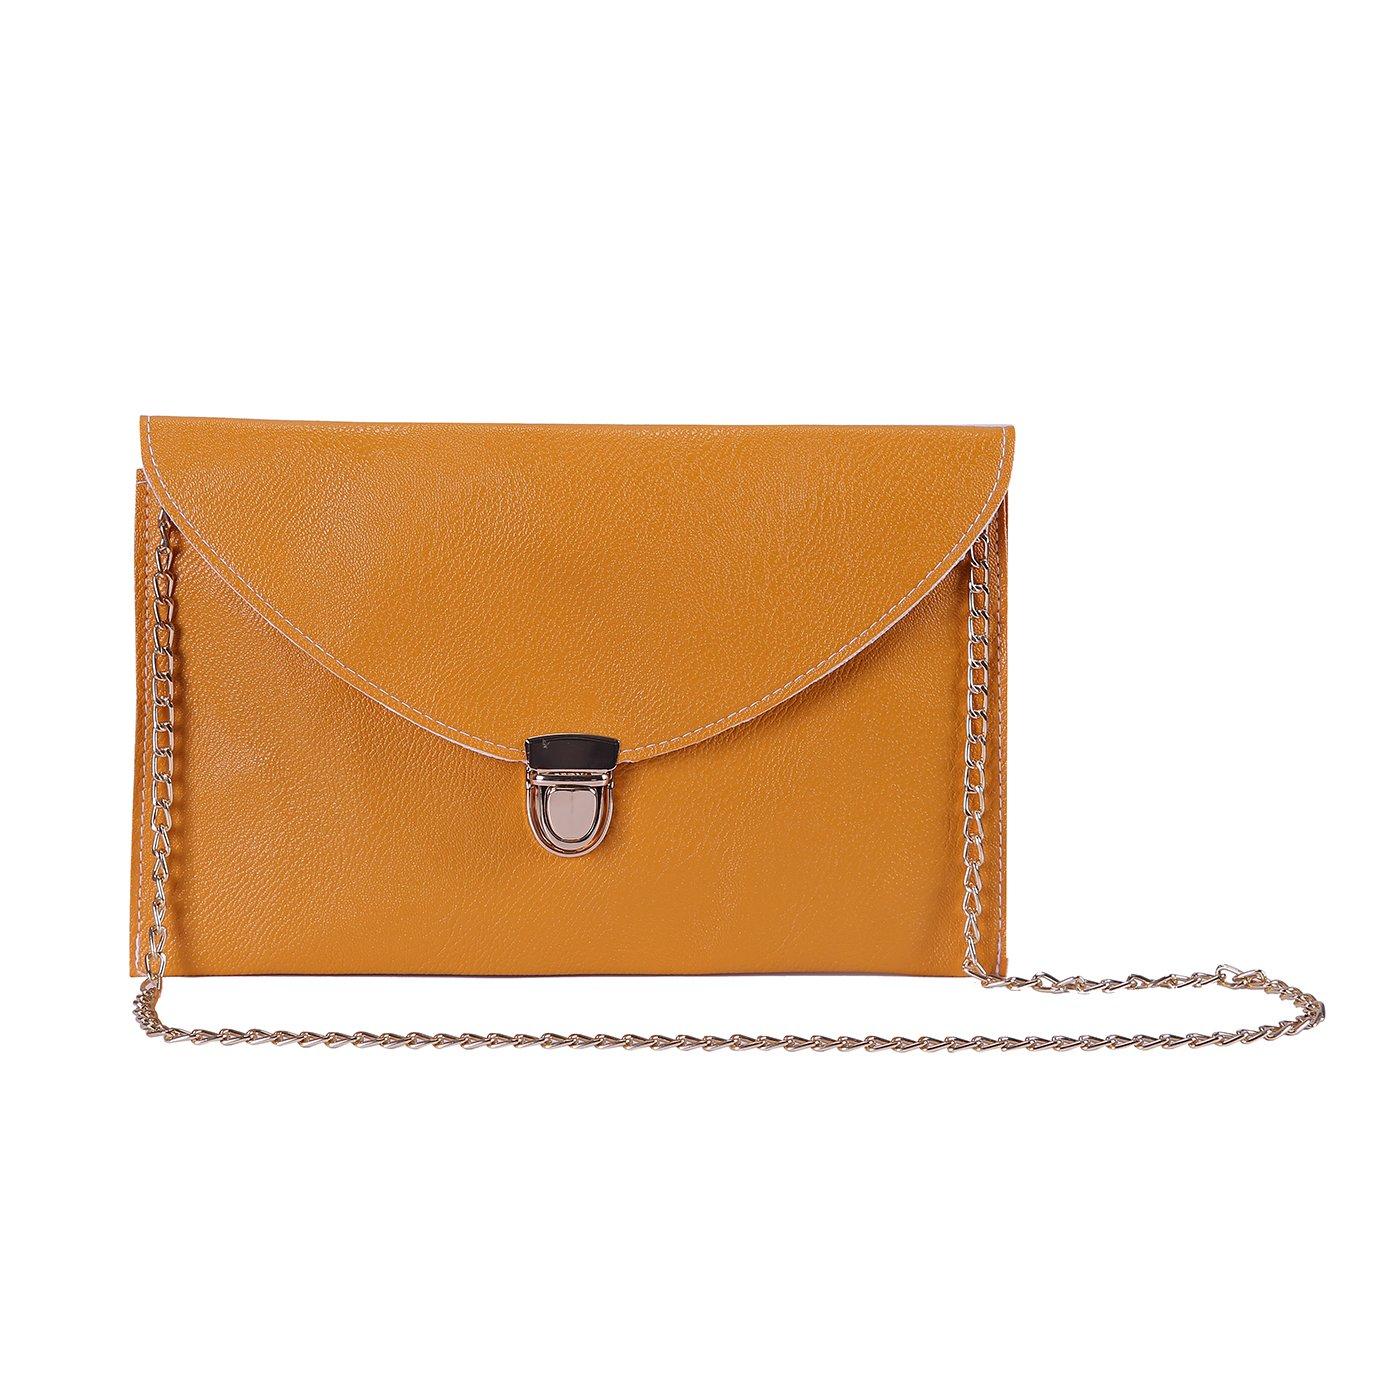 HDE Women's Fashion Cross Body Gold Buckle Purse Vegan Leather Envelope Handbag by HDE (Image #1)